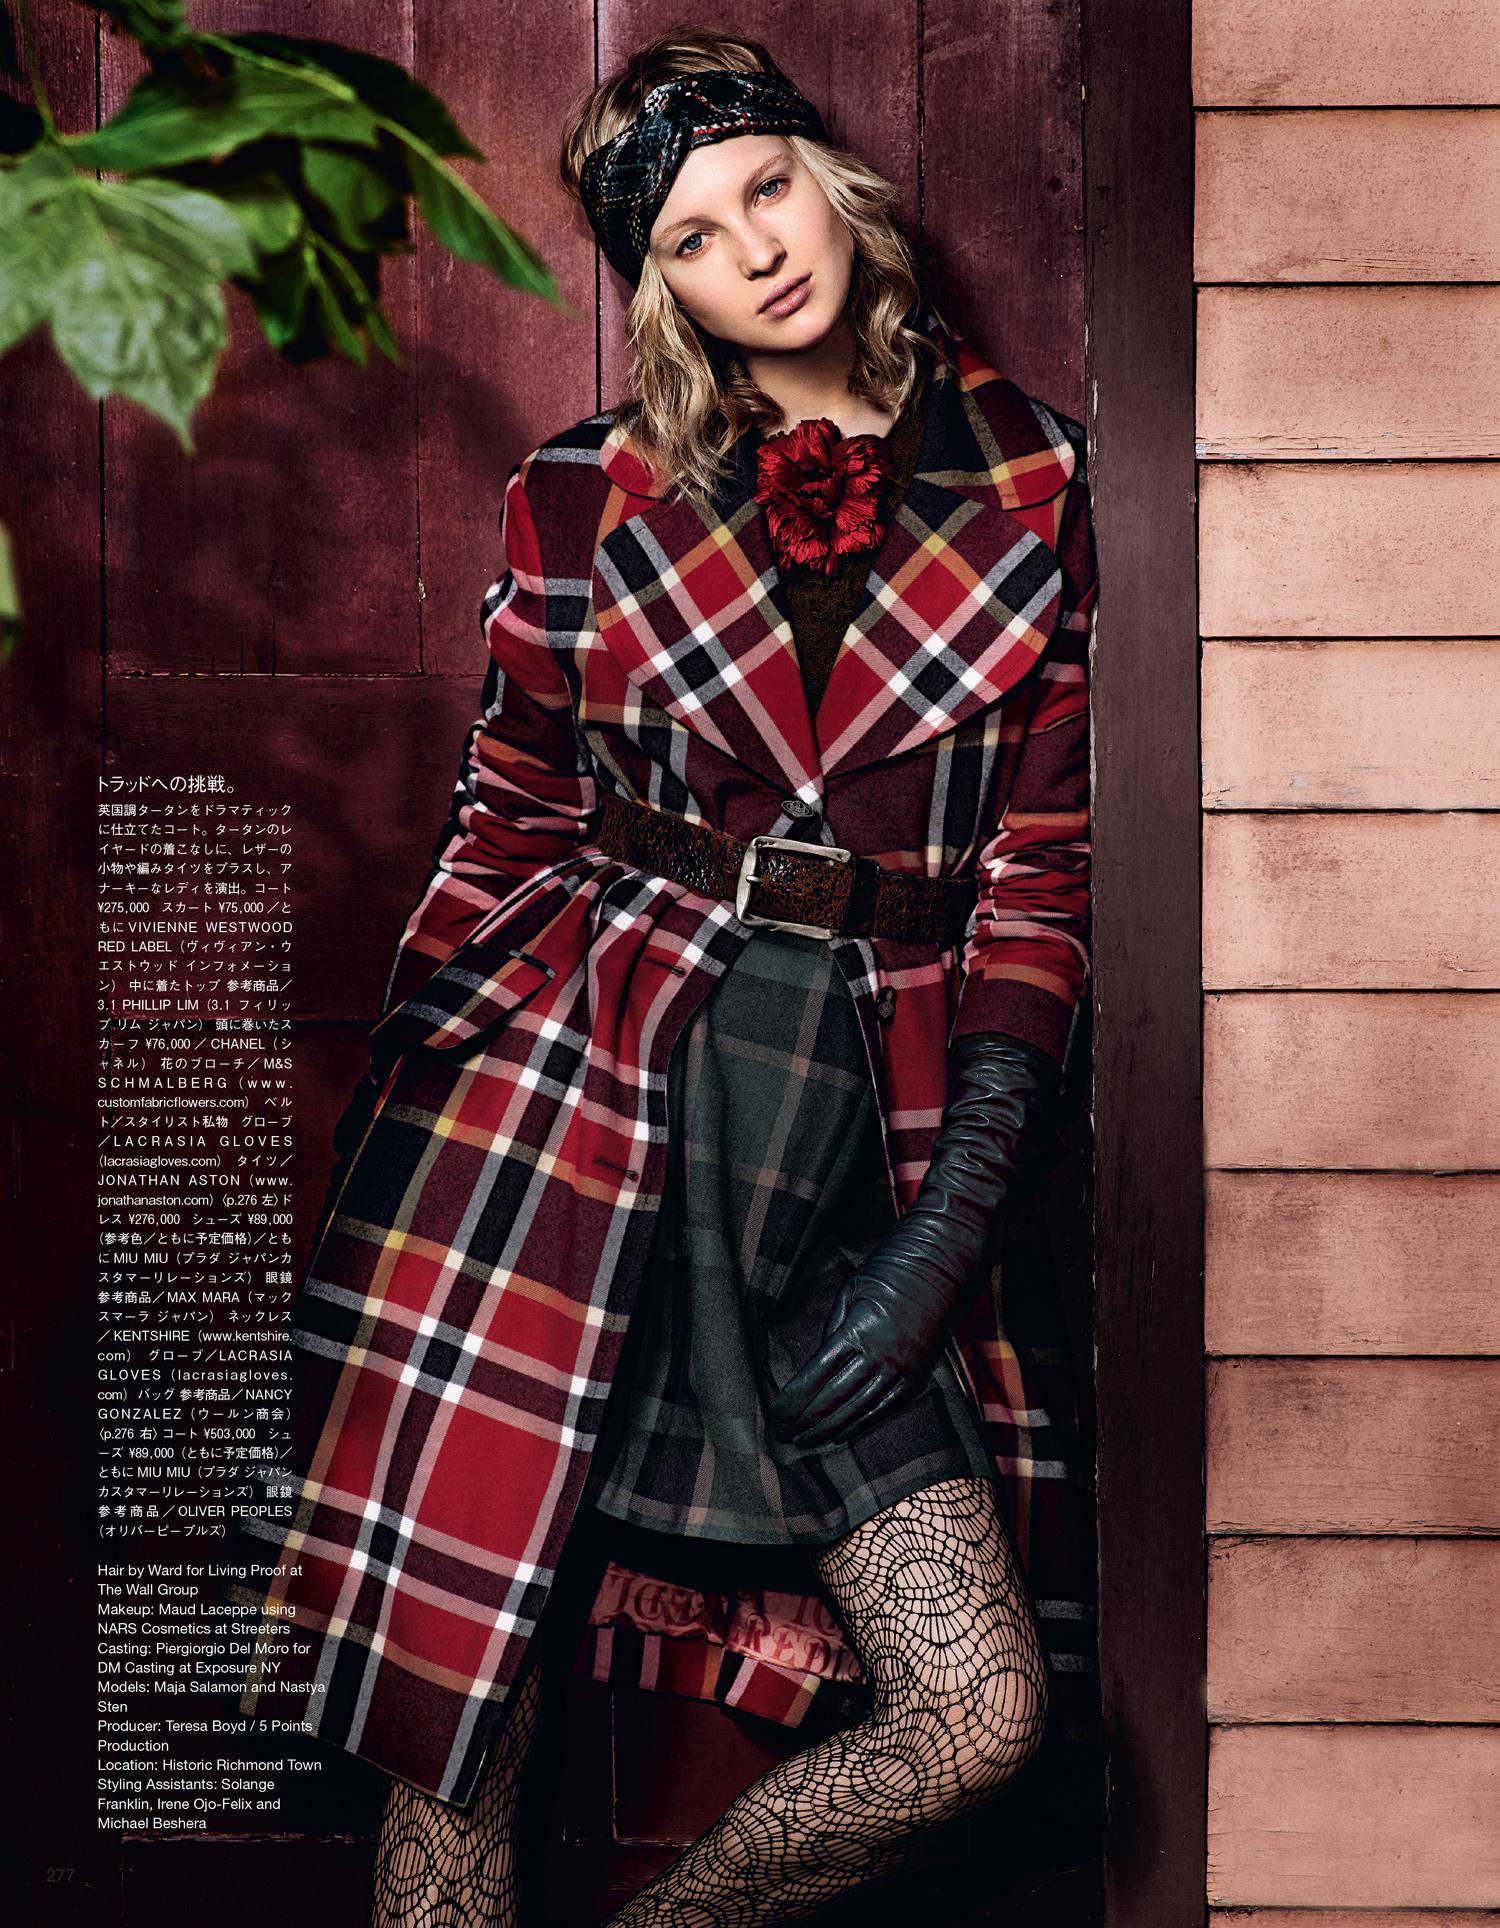 Giovanna-Battaglia-Into-the-Woods-Vogue-Japan-January-2016-8.jpg